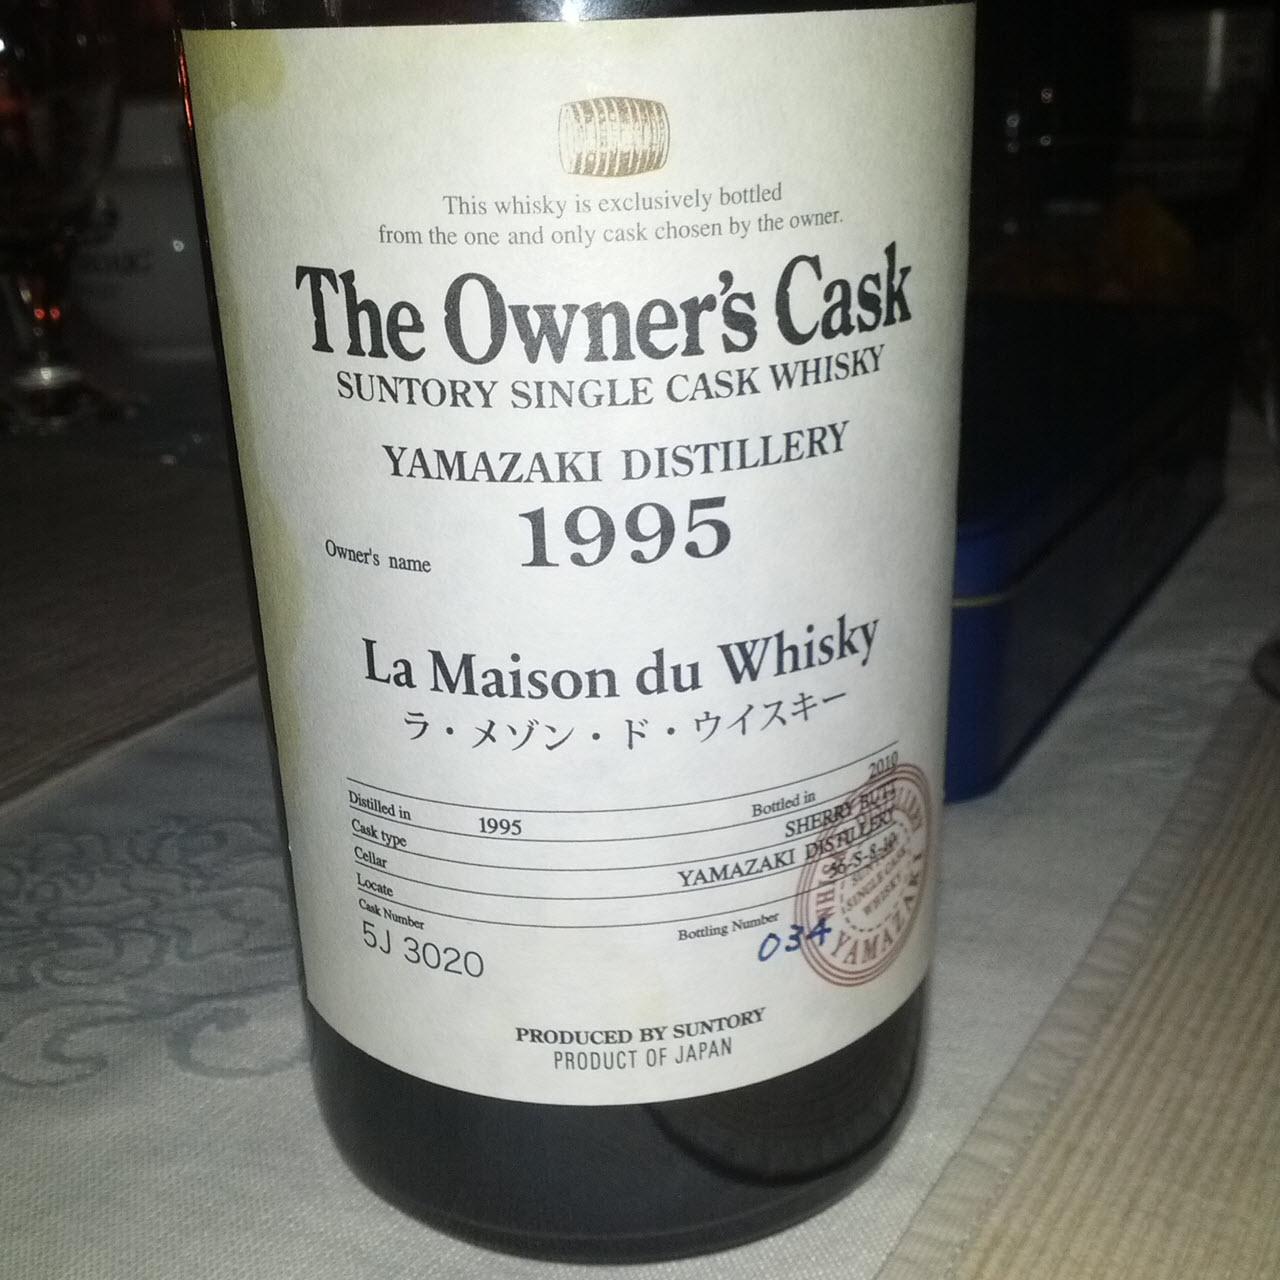 Yamazaki 1995 15 YO The Owner's Cask